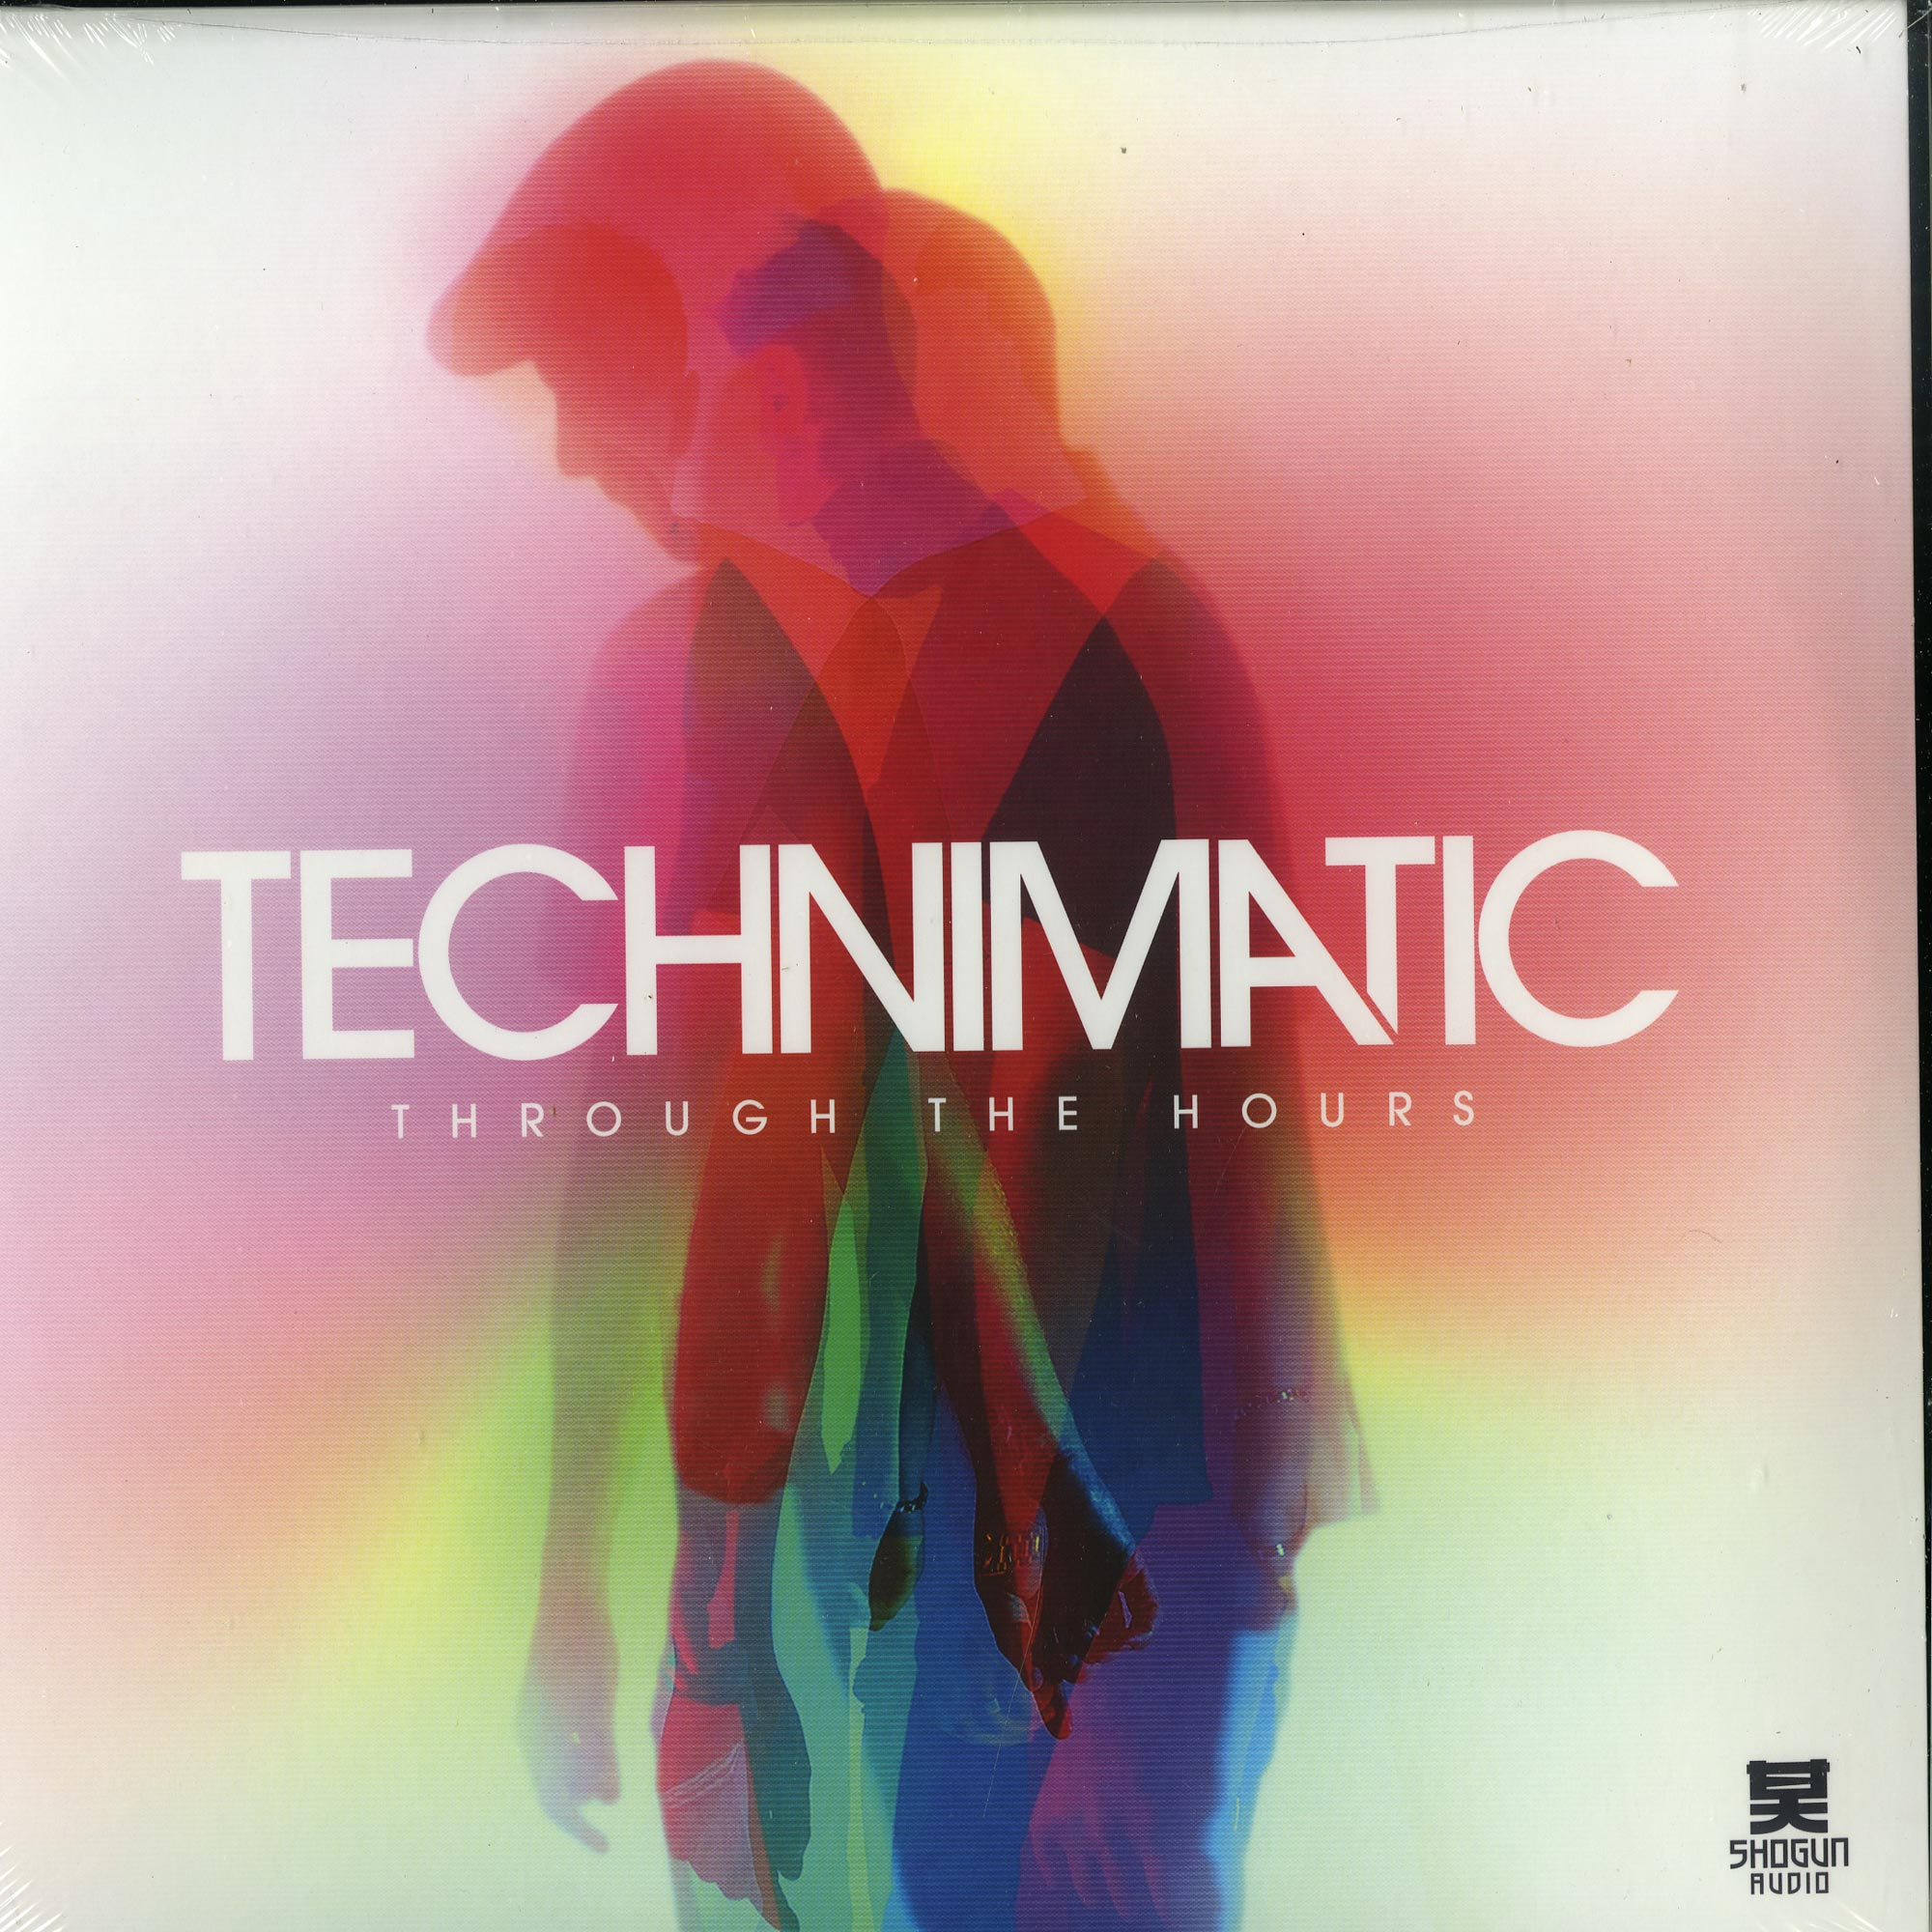 Technimatic - THROUGH THE HOURS